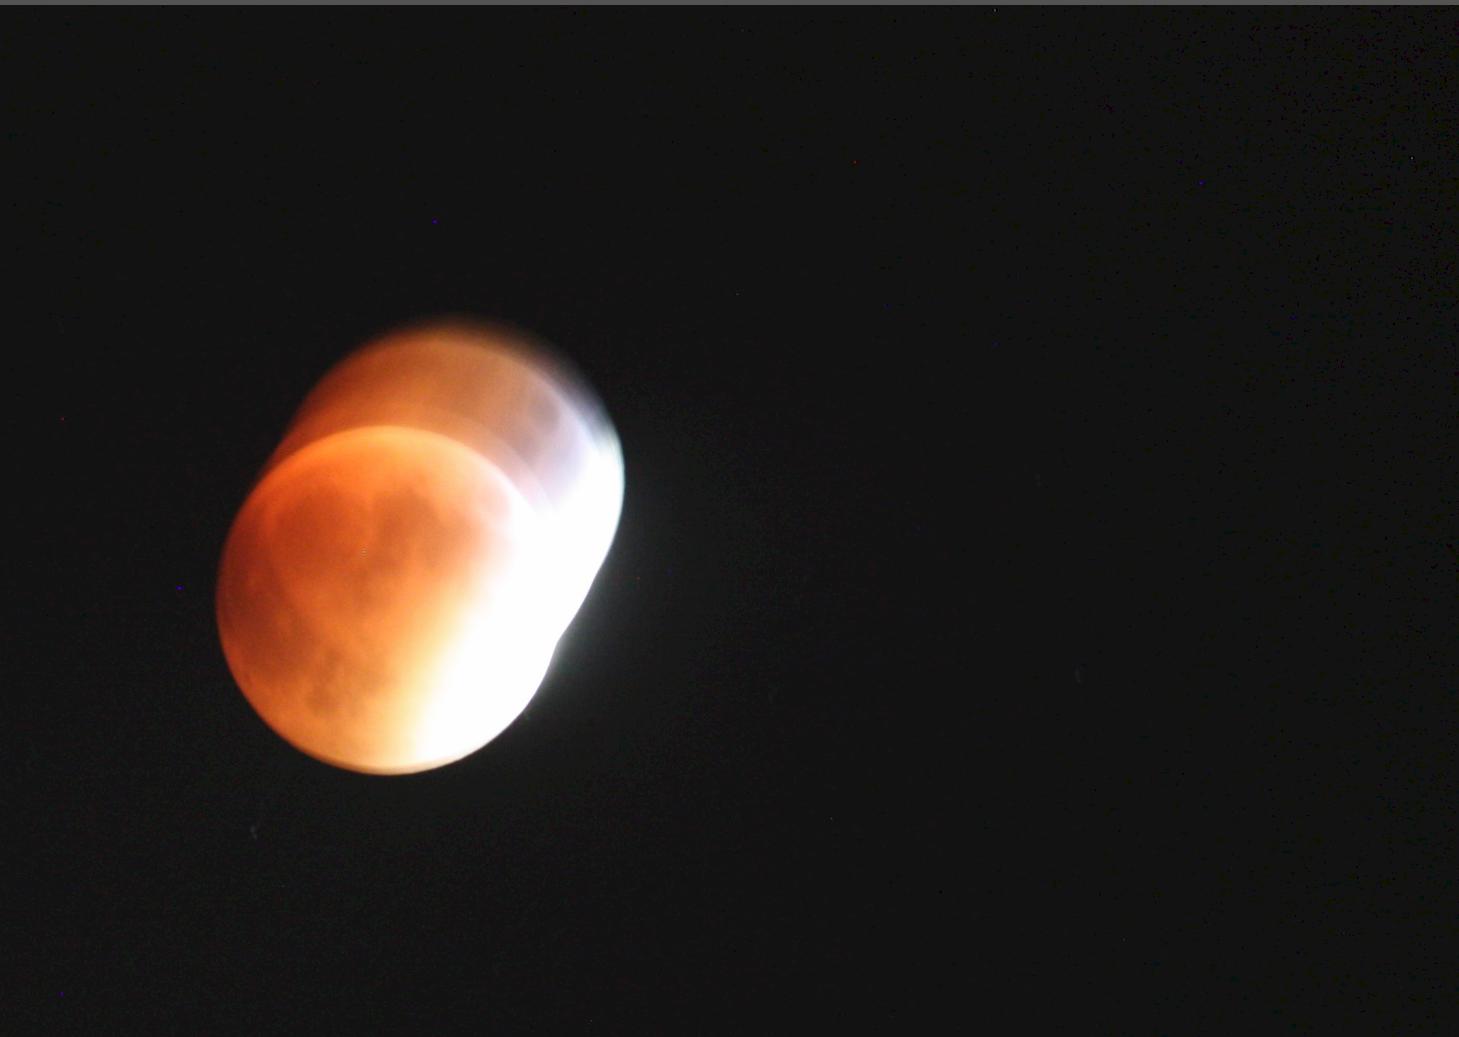 blood moon january 2019 saskatchewan - photo #16